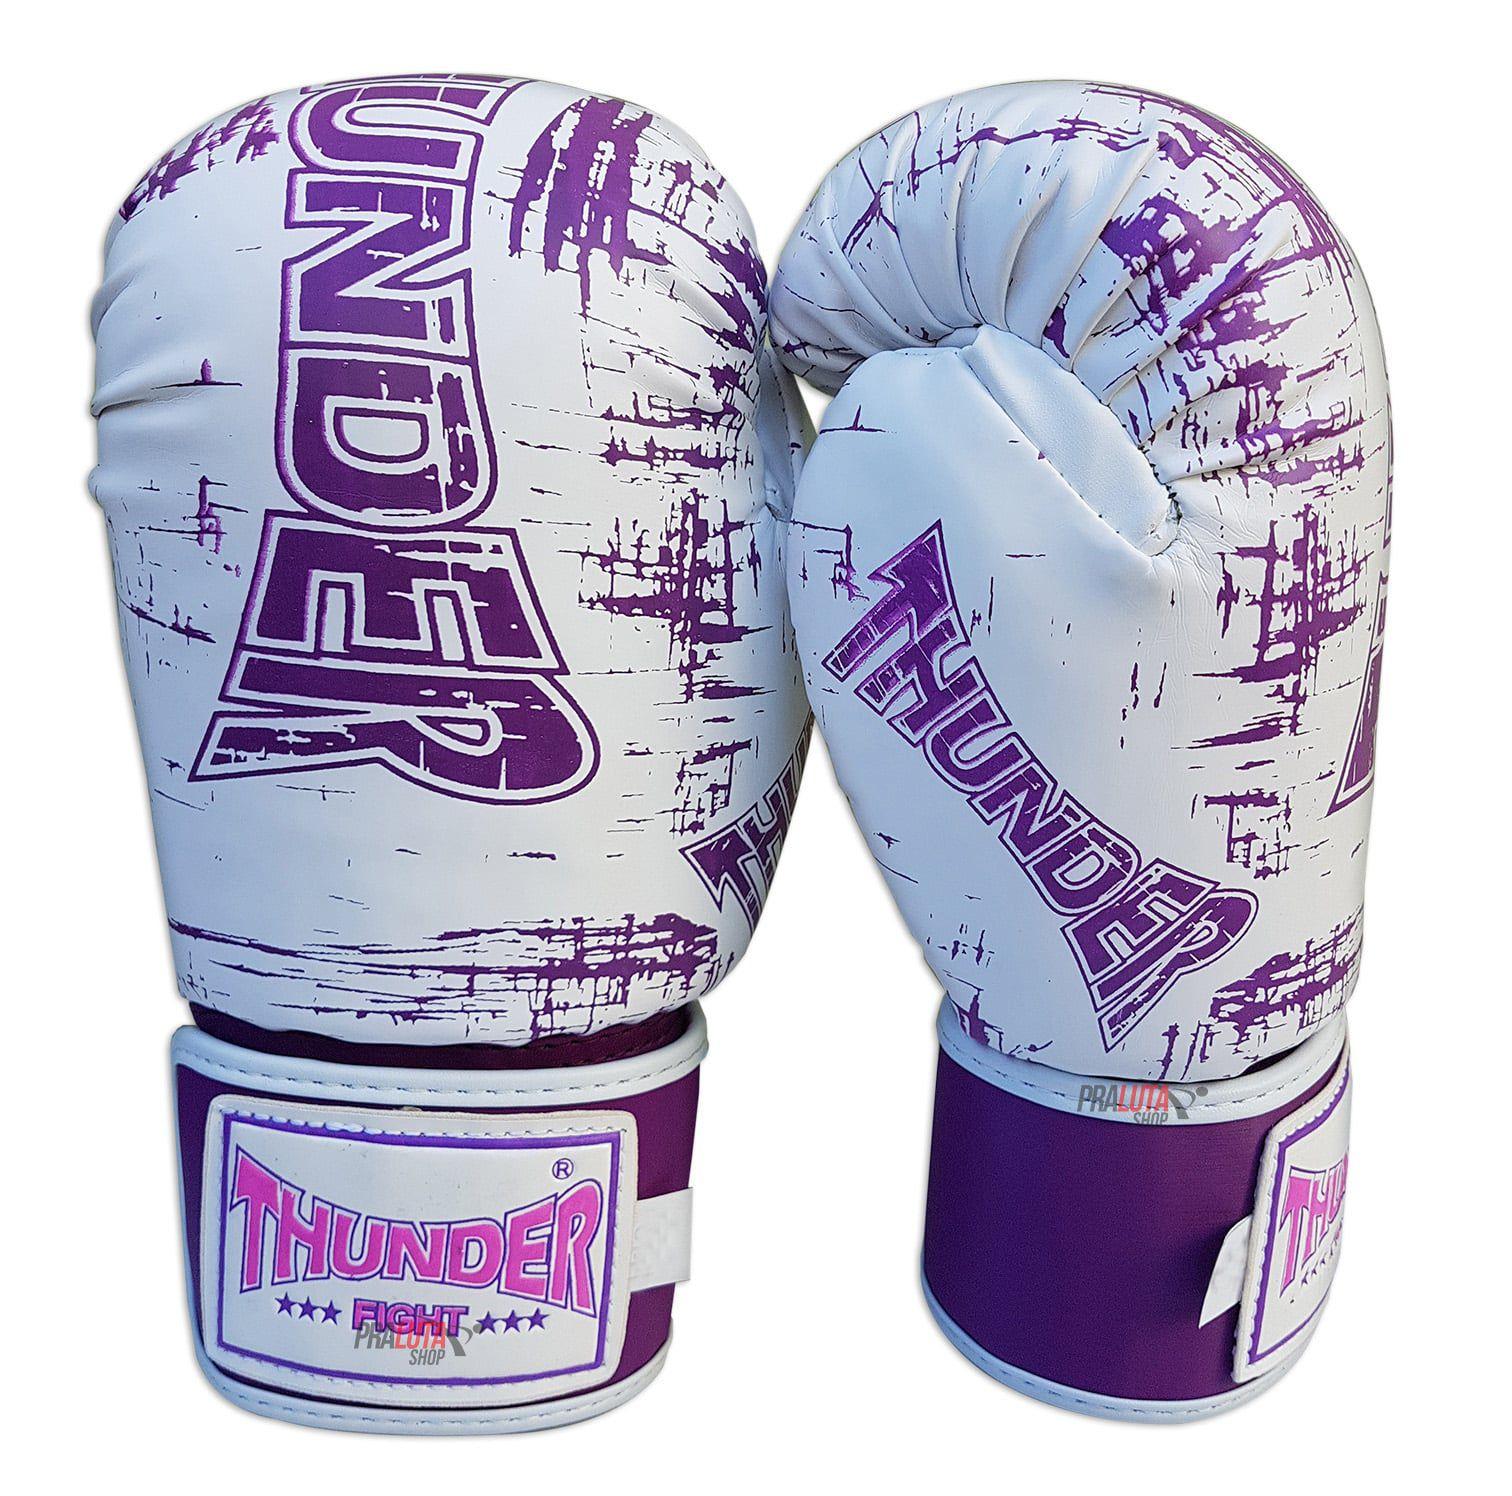 bc2b153d6 Luva de Boxe   Muay Thai 12oz Feminina - Branco Riscado Lilás - Thunder  Fight ...